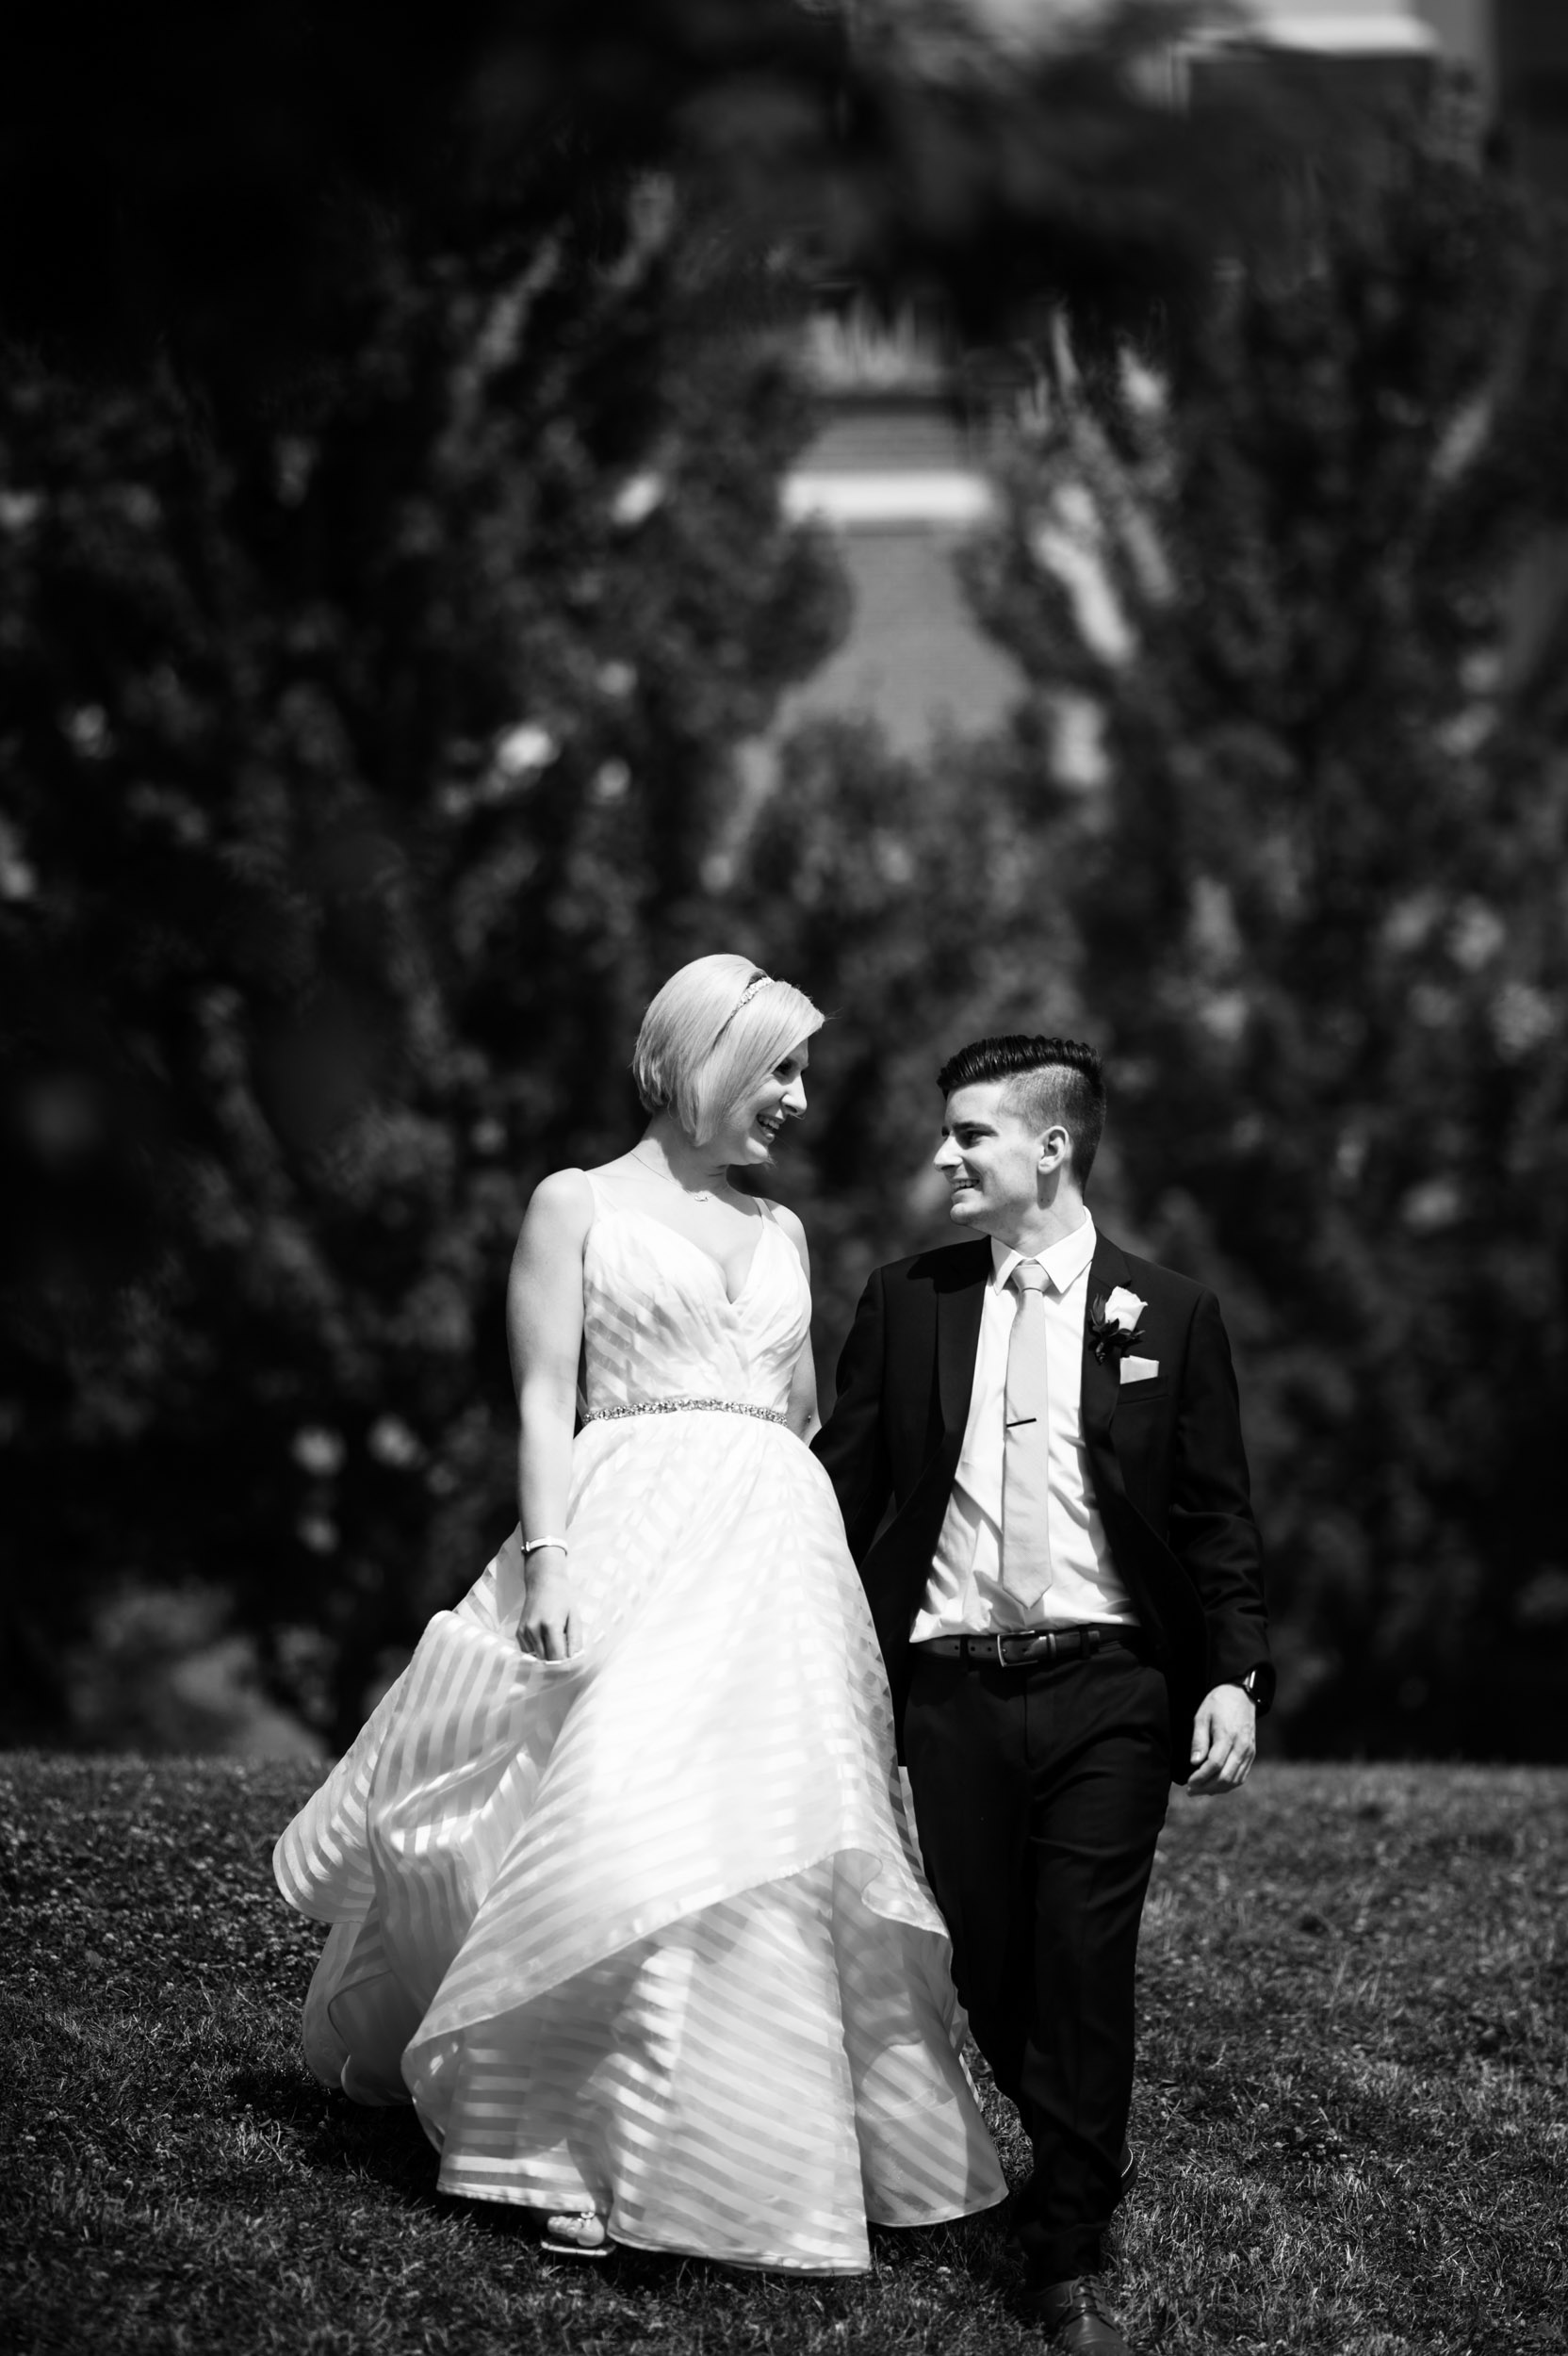 Wedding photos at Mary Bartleme Park